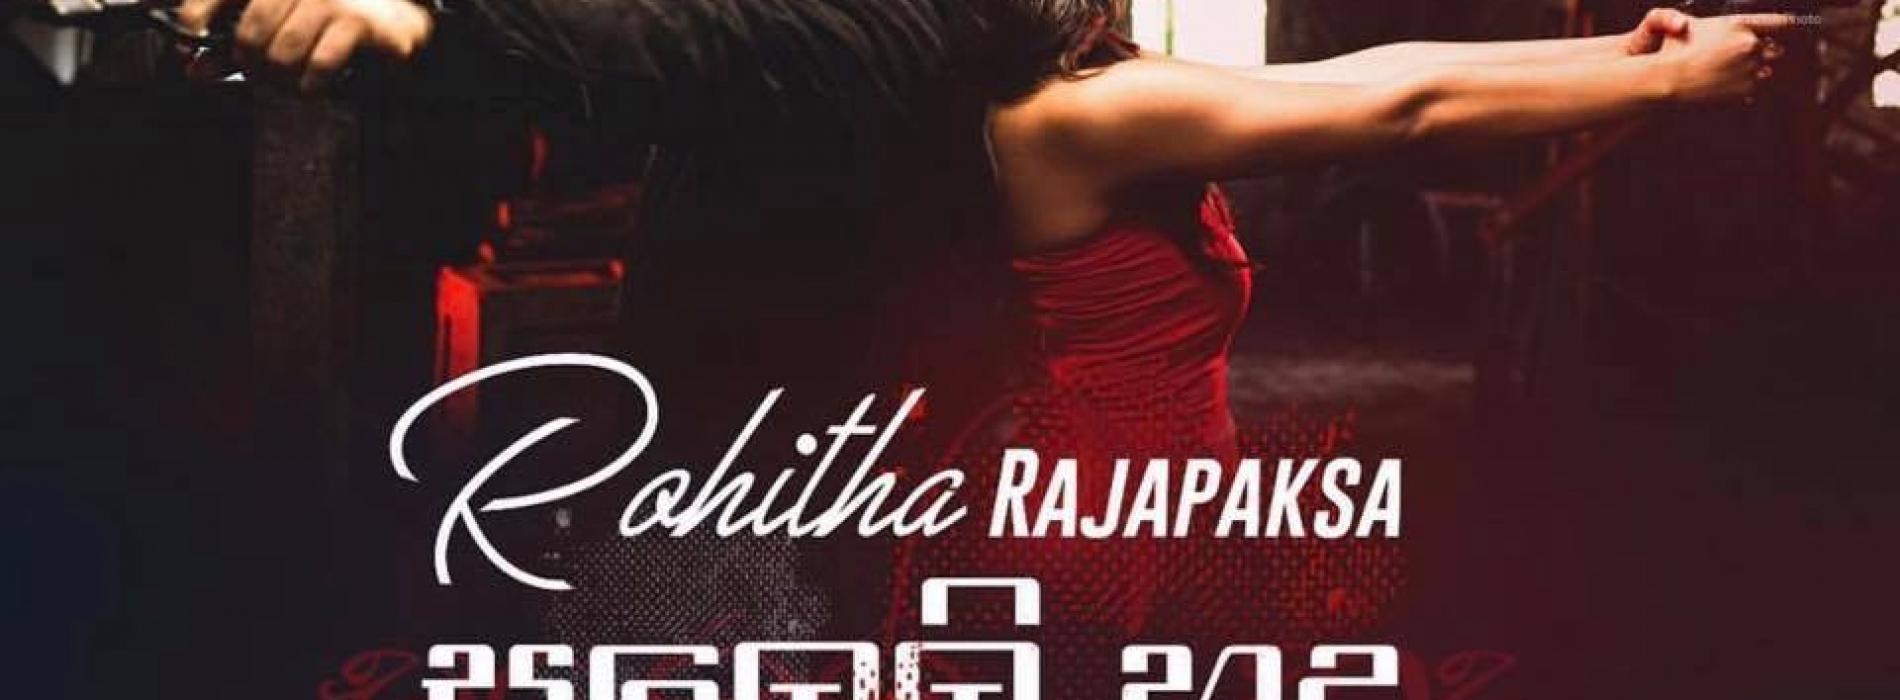 Rohitha Rajapaksa – Saleli Hada (සලෙලි හද) Trailer